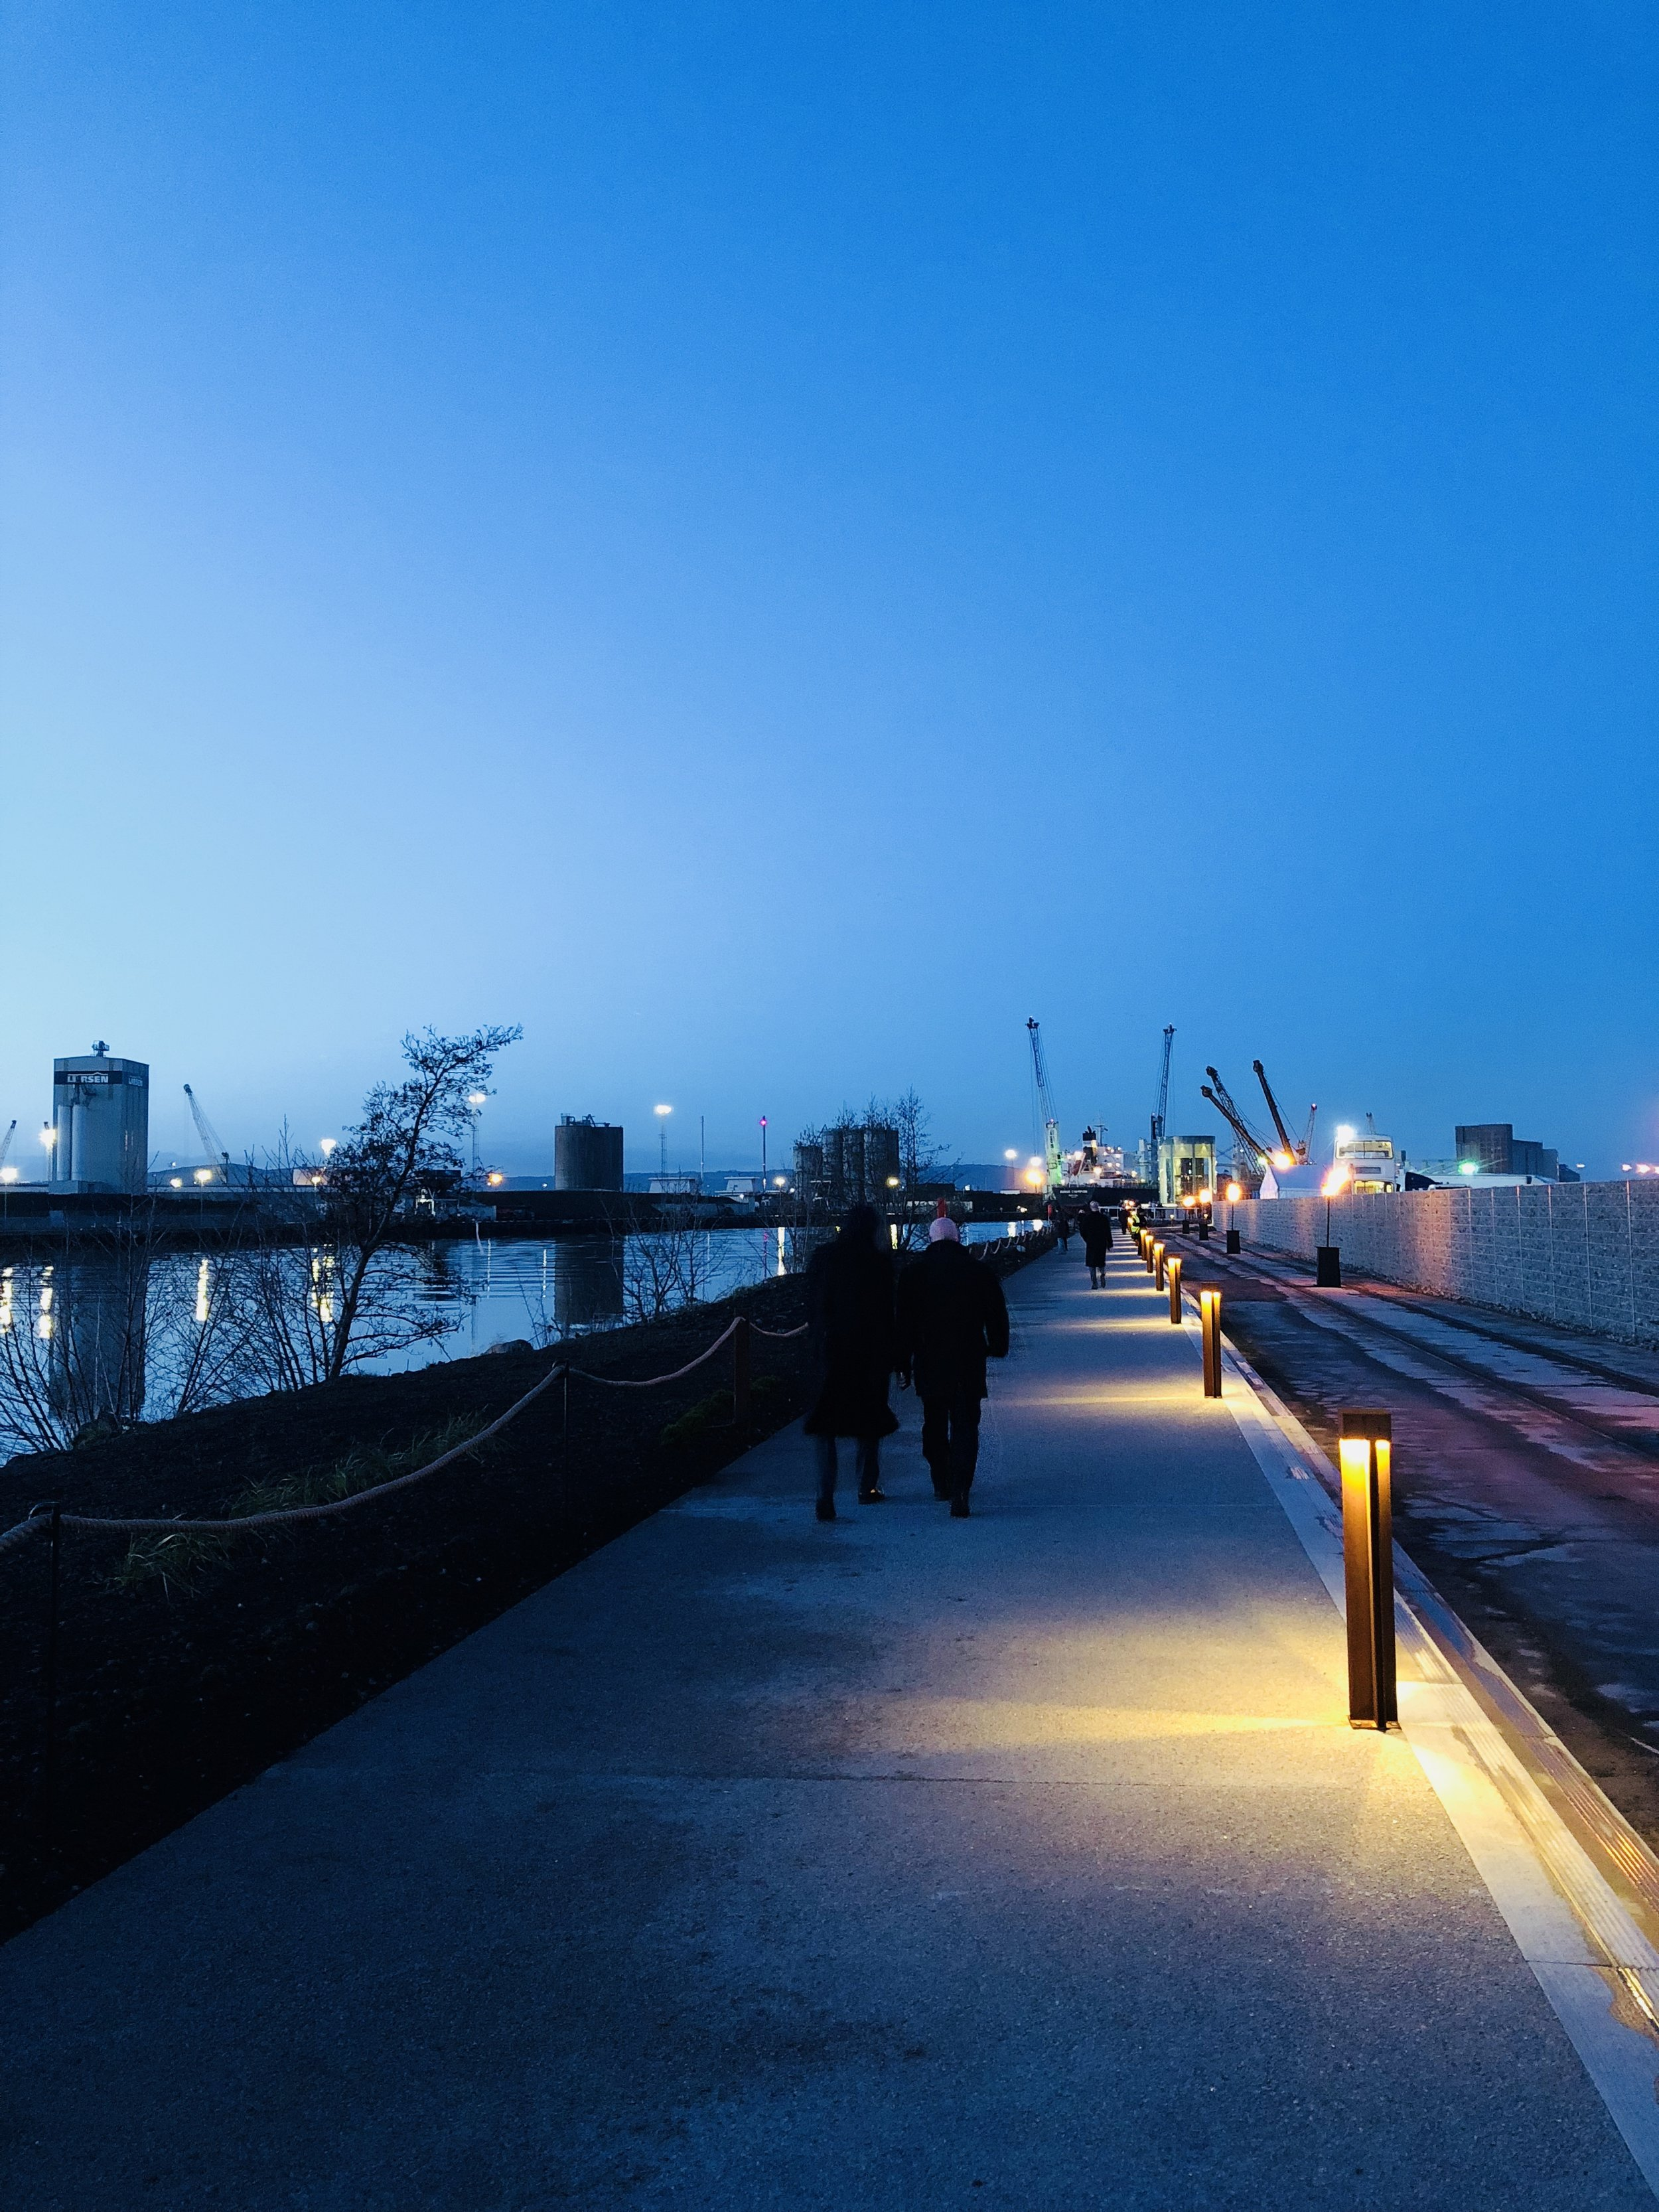 great_light_titanic_walkway_belfast_ni_explorer (4).JPGgreat_light_titanic_walkway_belfast_ni_explorer